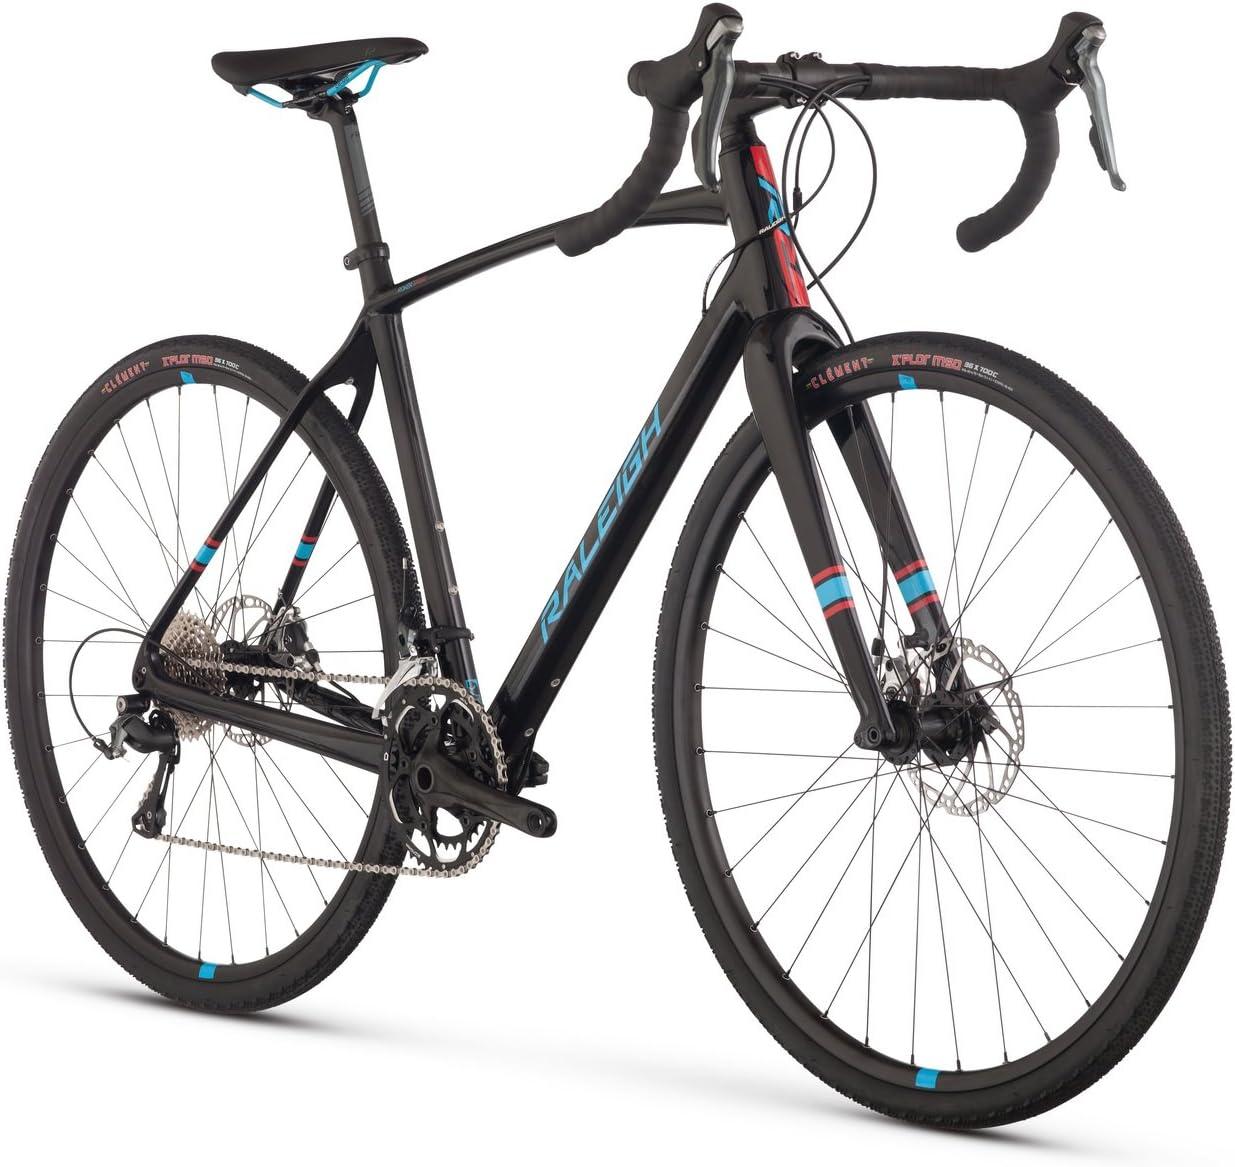 Raleigh Bikes Roker Sport All Road Bike